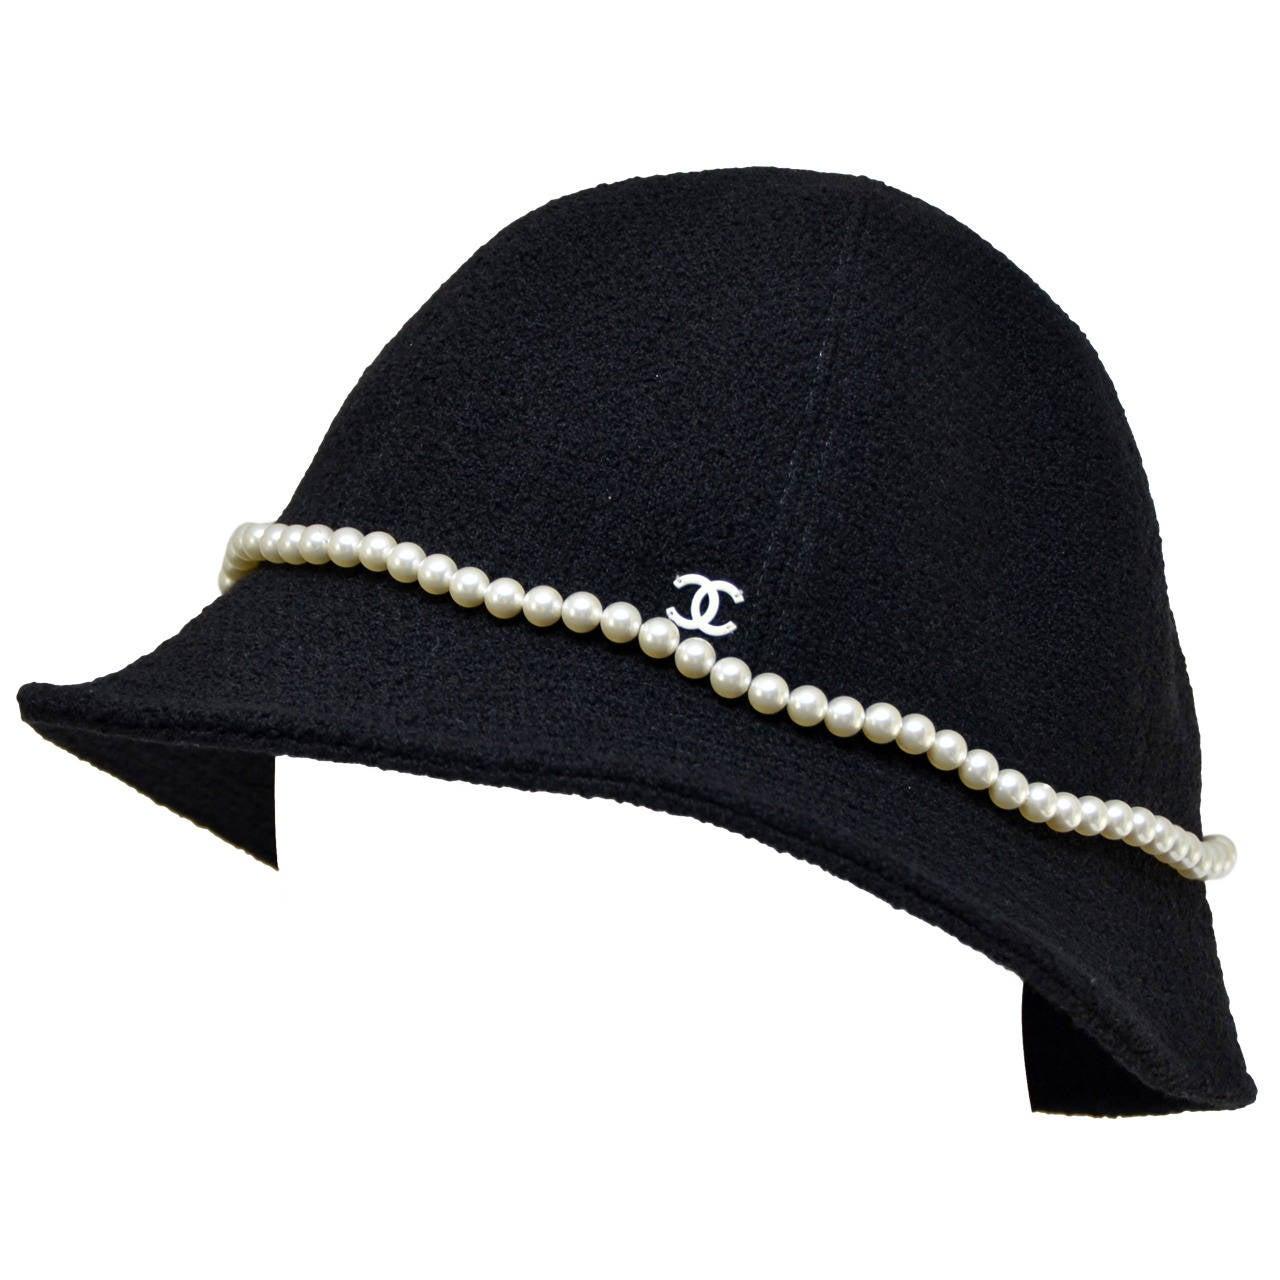 Chanel Pearl Tweed Hat at 1stdibs